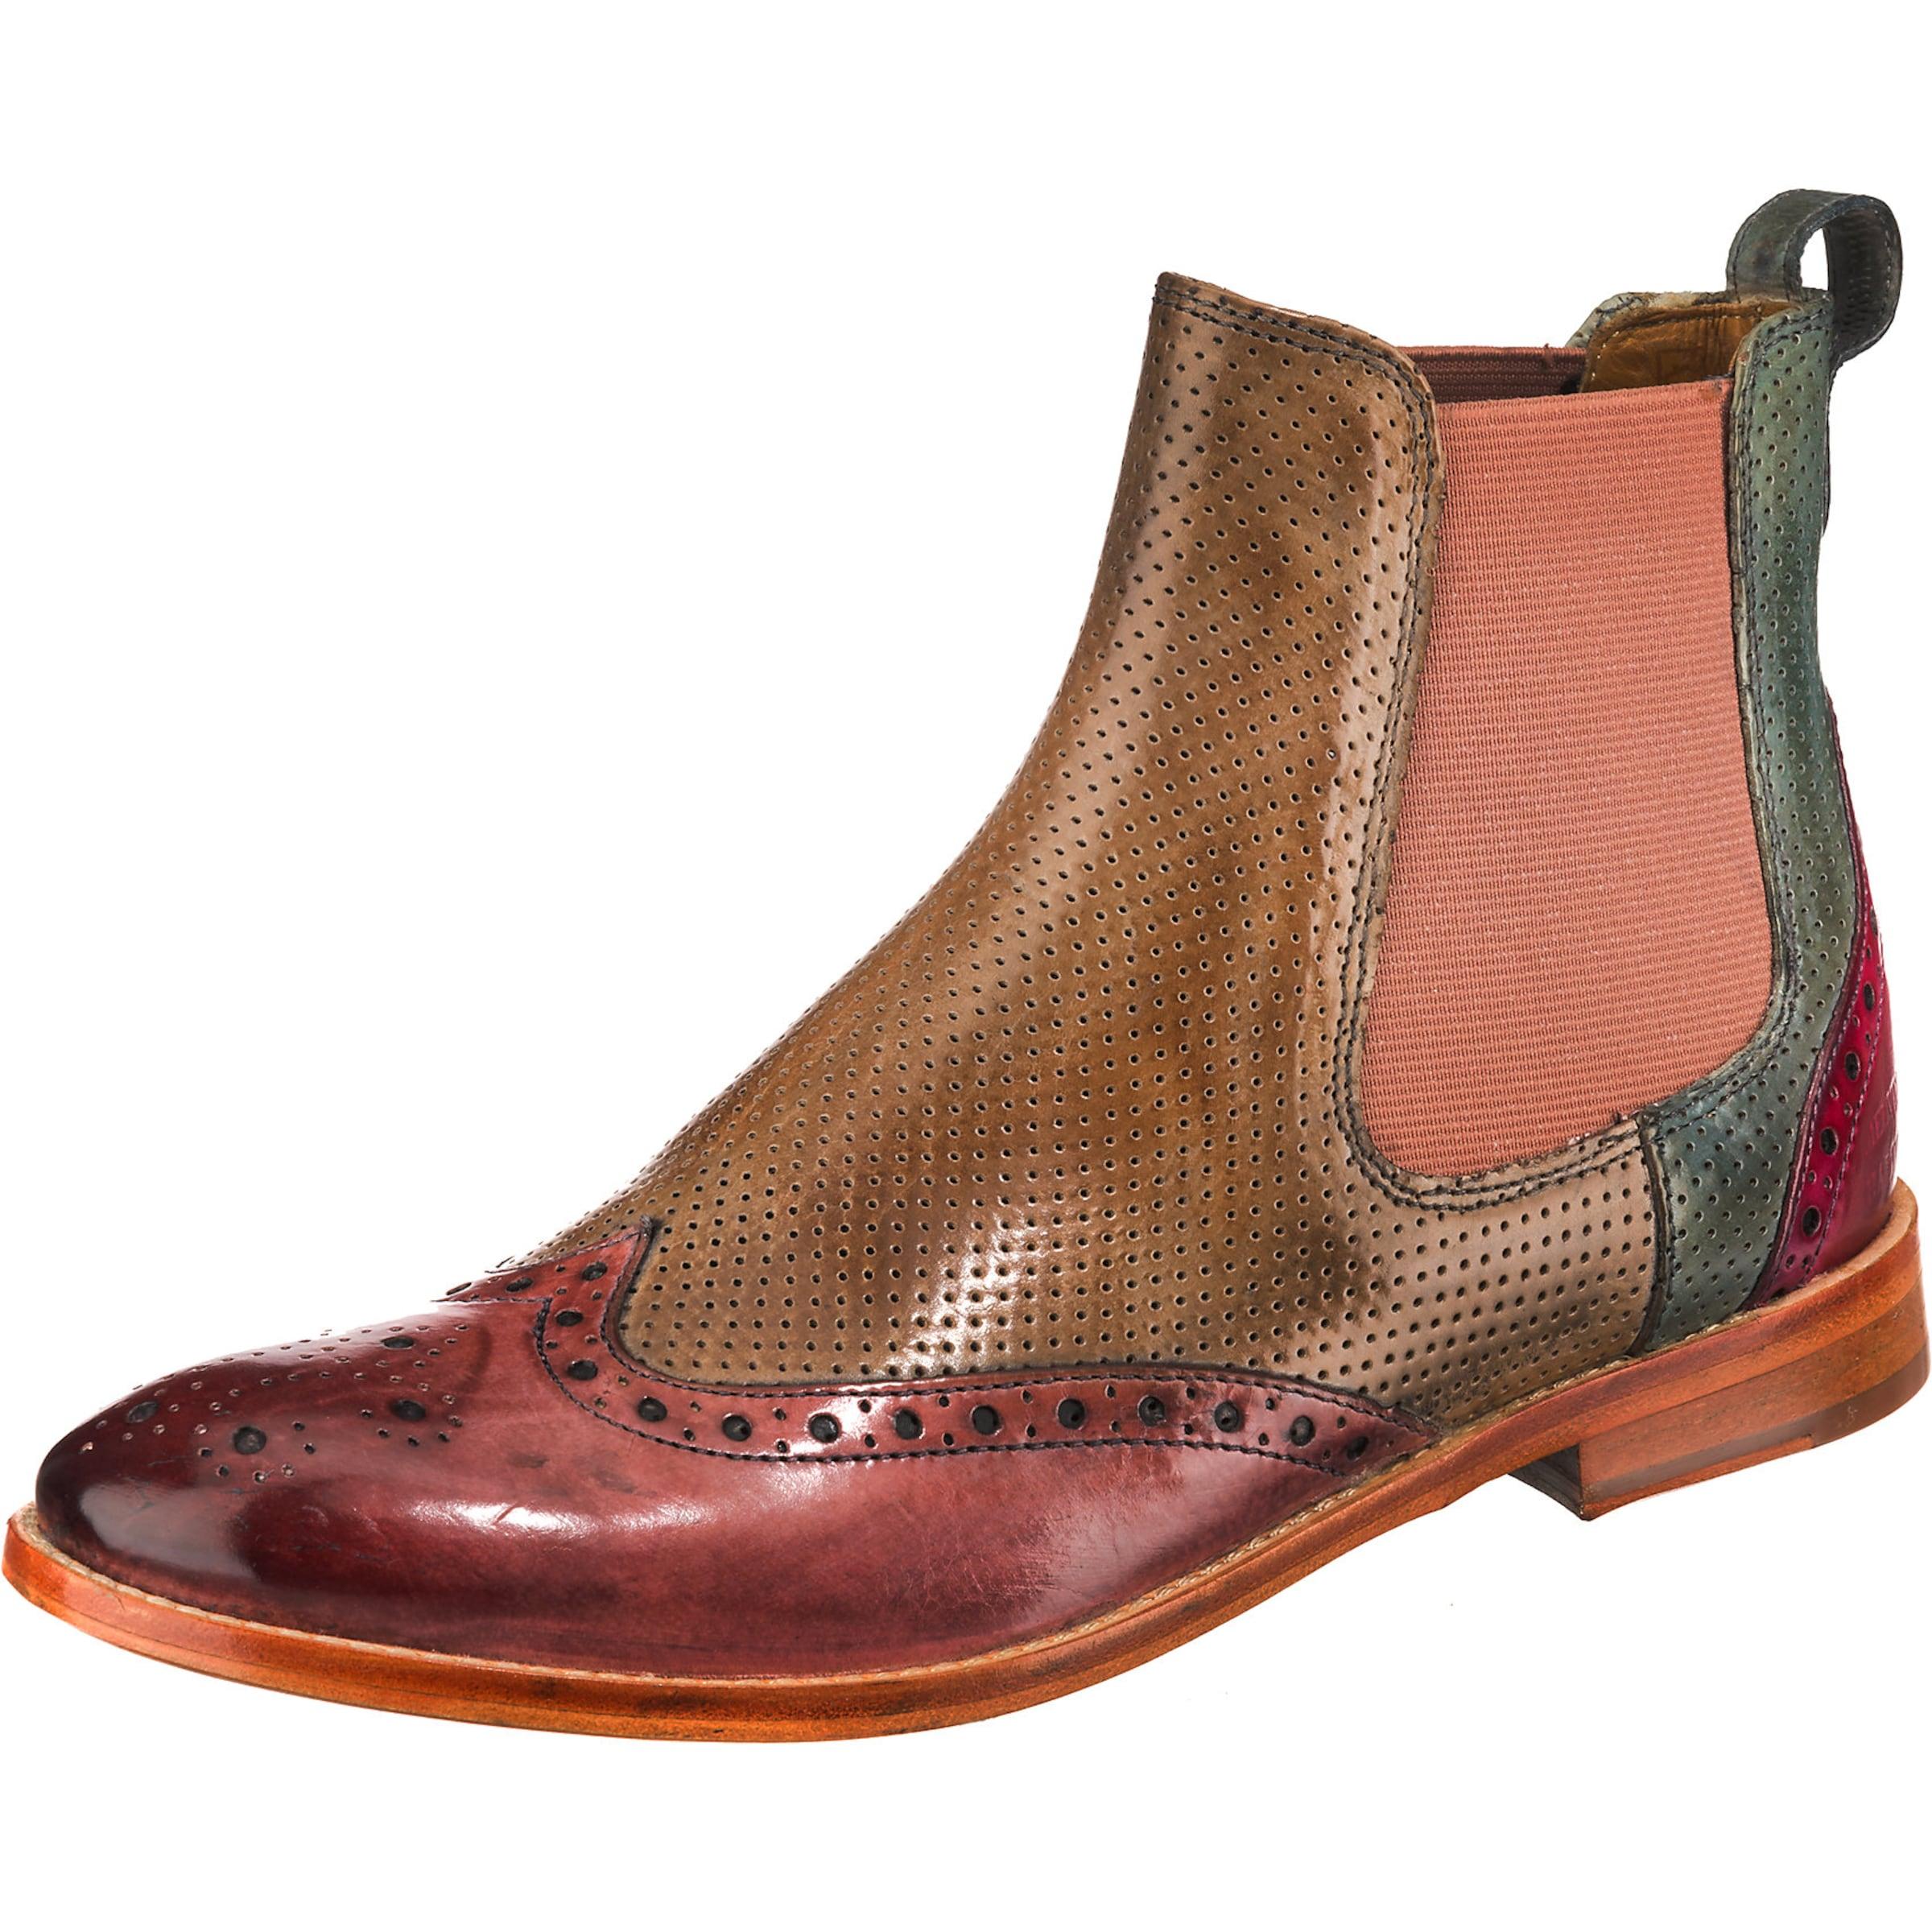 Altrosa Melvinamp; 'amelie' Boots In Chelsea Pastellrot HellbraunOliv Hamilton IH29ED